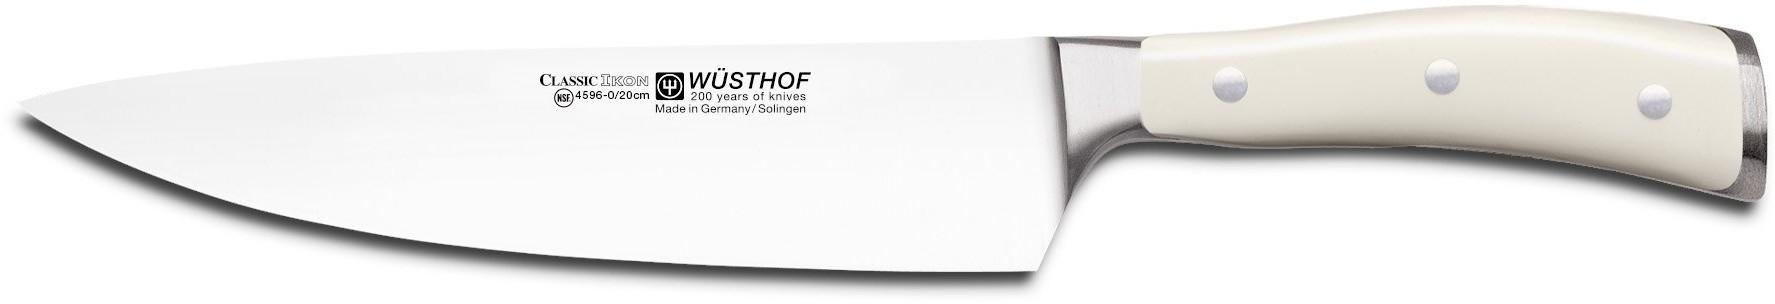 Wusthof Nóż szefa kuchni 20 cm Classic Ikon Creme W-4596-0-20